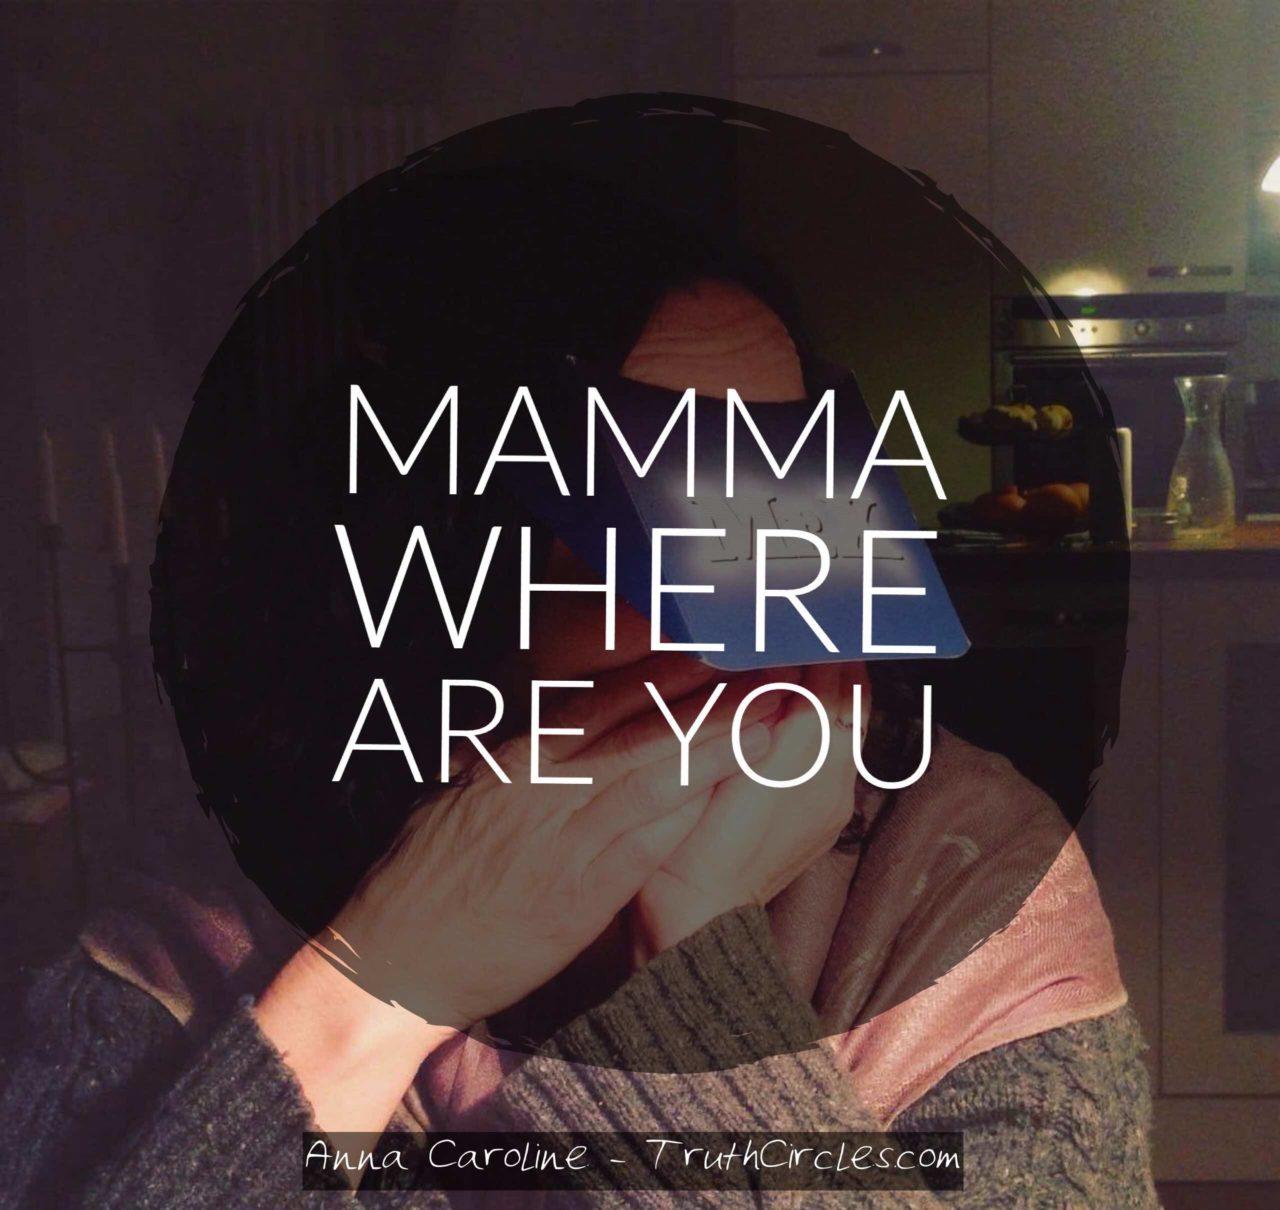 Mama where are you